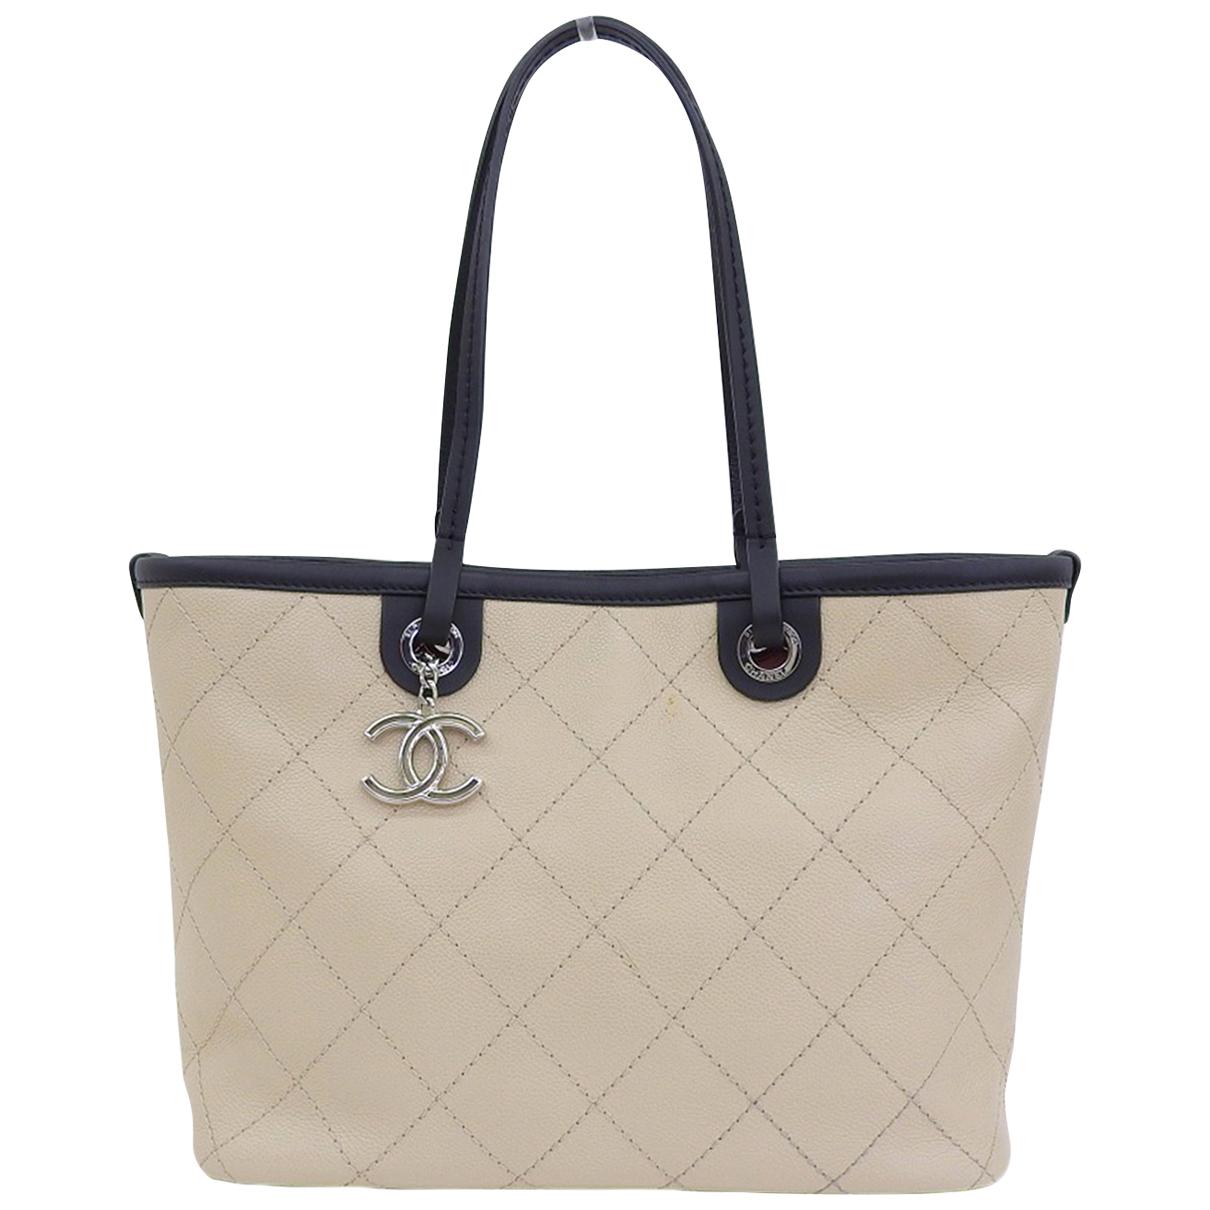 Chanel \N Handtasche in  Ecru Leder